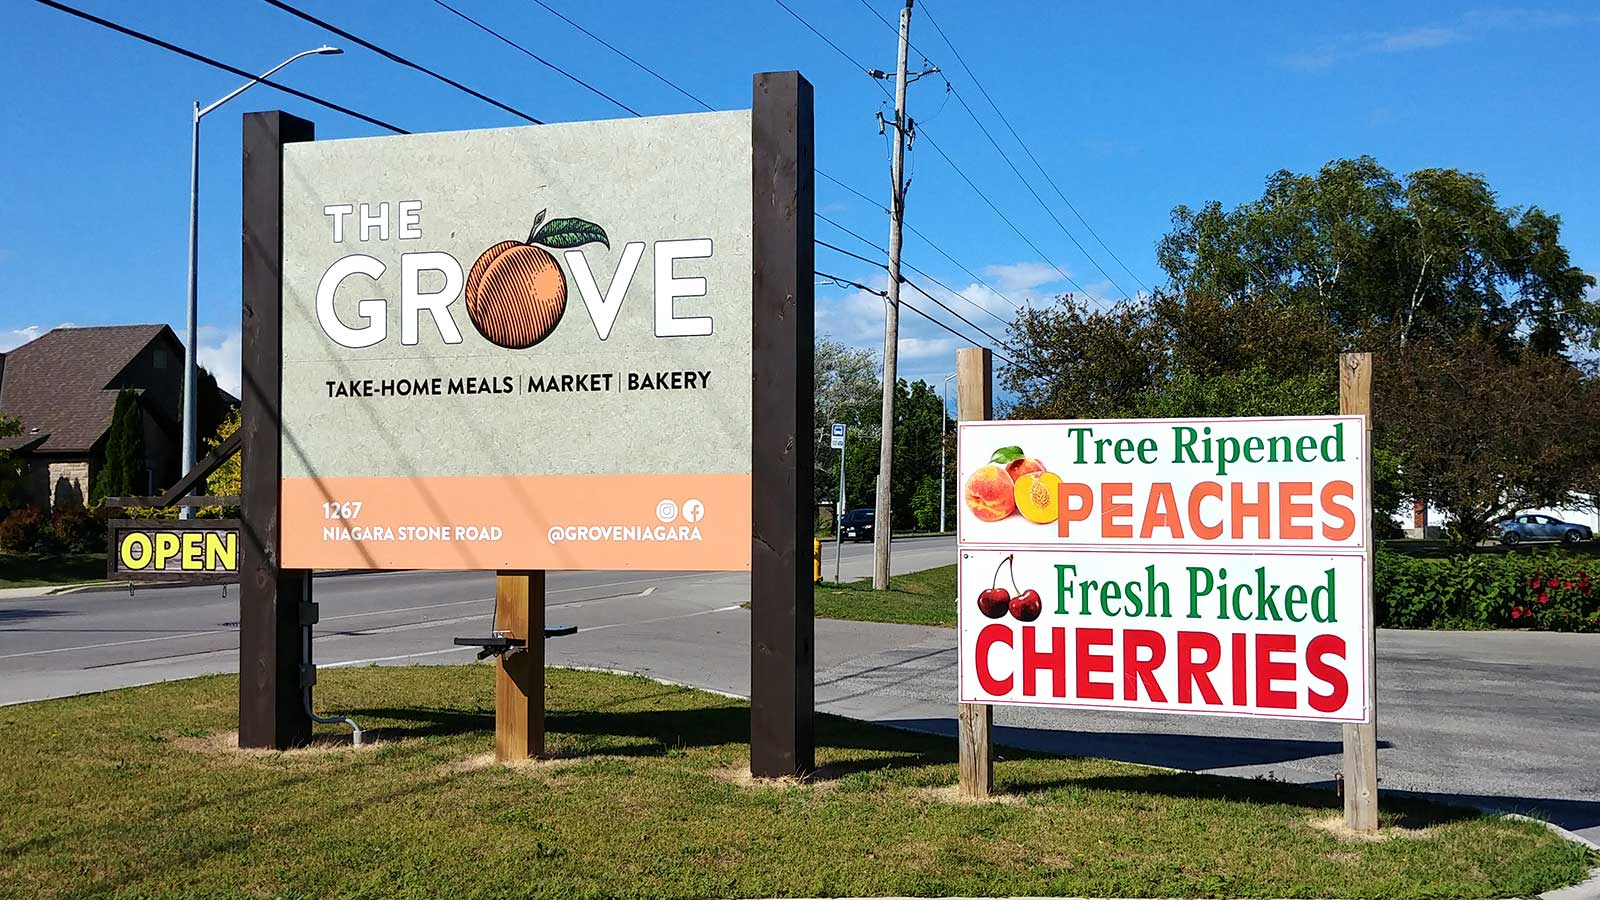 The Grove Farm Shop in Niagara on the Lake